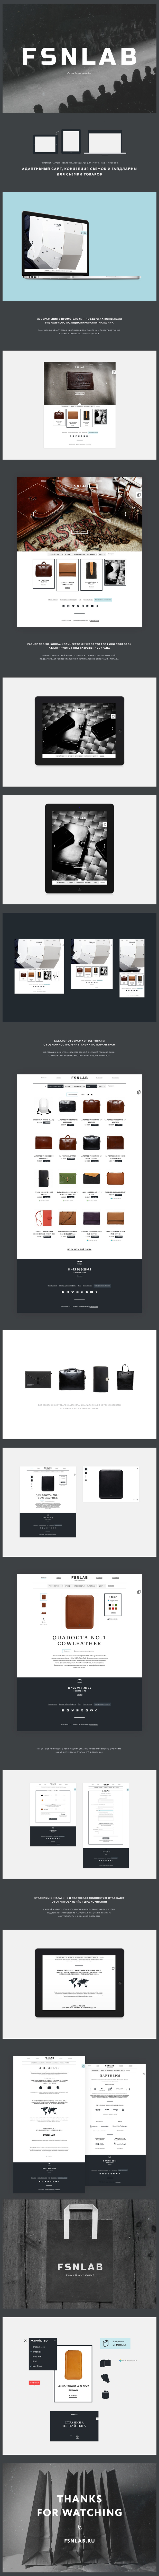 FSNLAB - магазин приятных чехлов, Сайт © CreativePeople